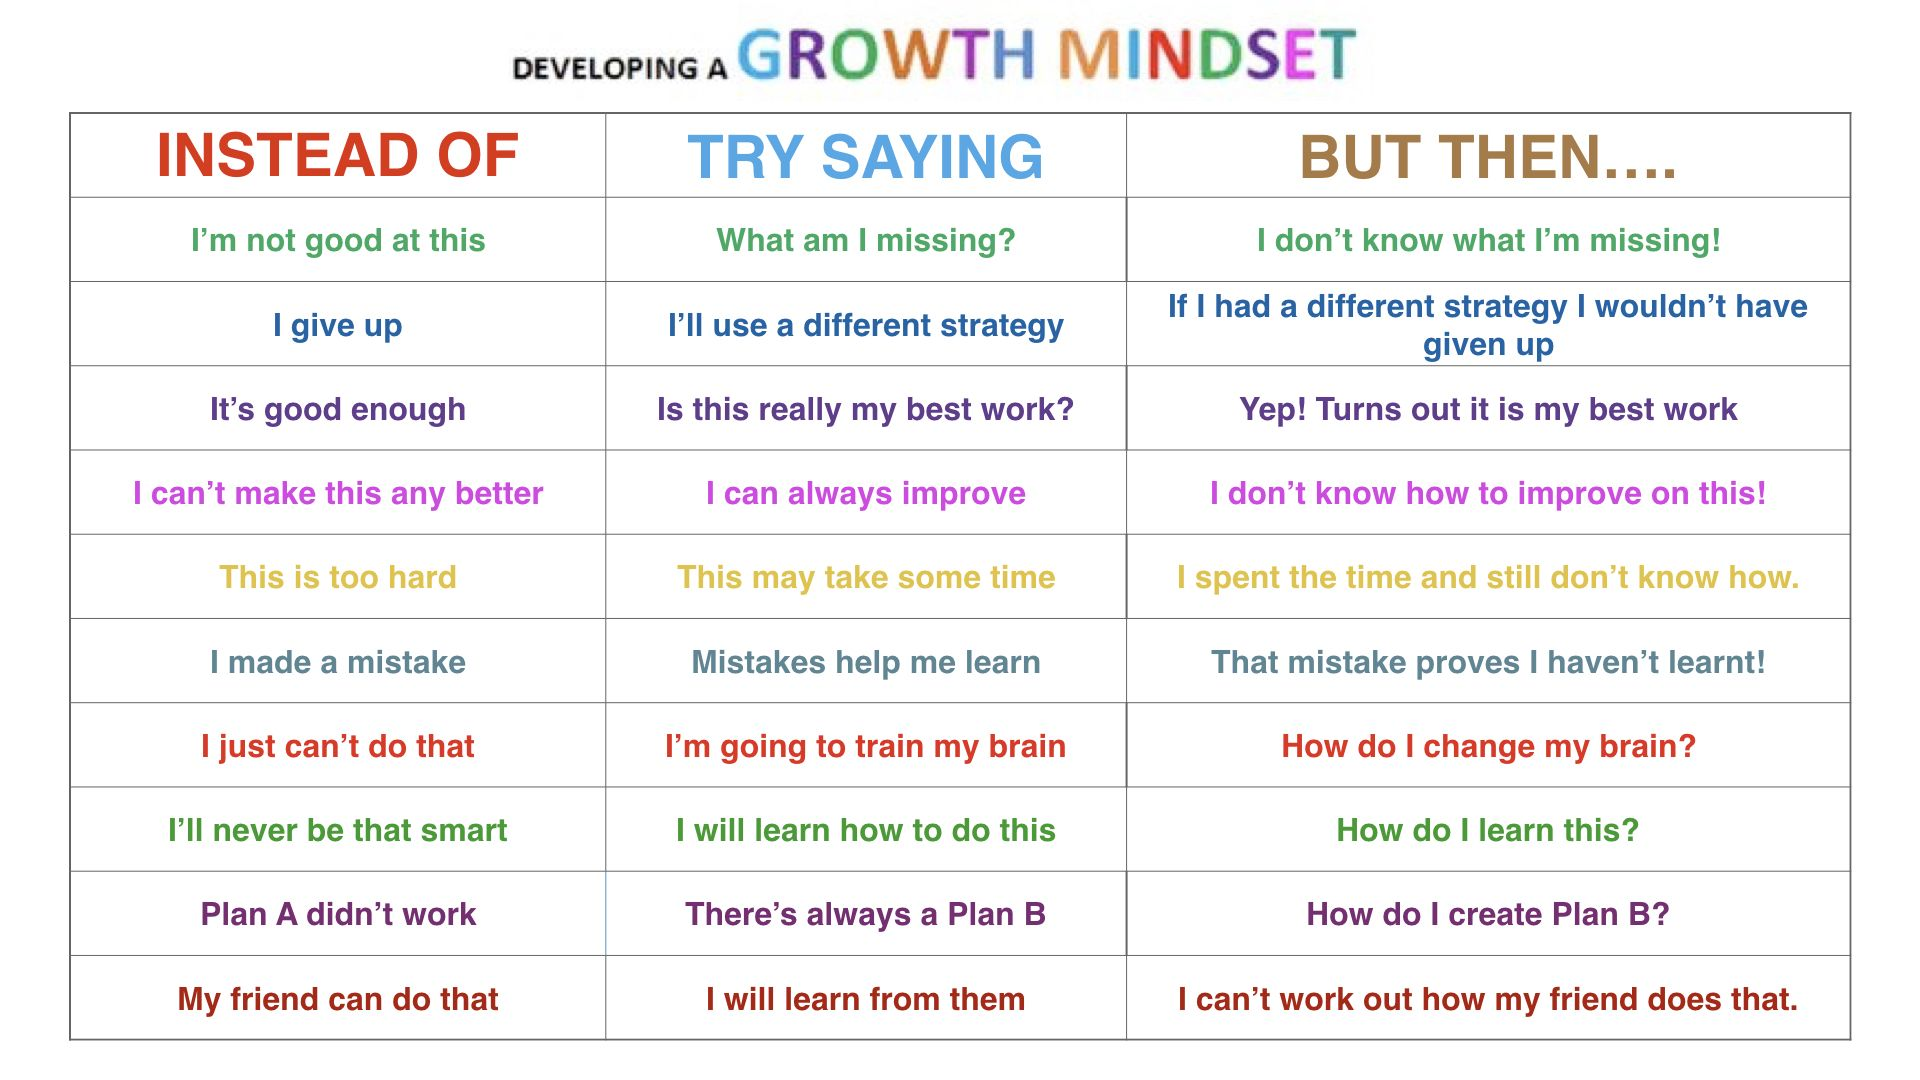 Change Your Mindset Then Change Your Words Mindful By Design Words Mindset Growth Mindset